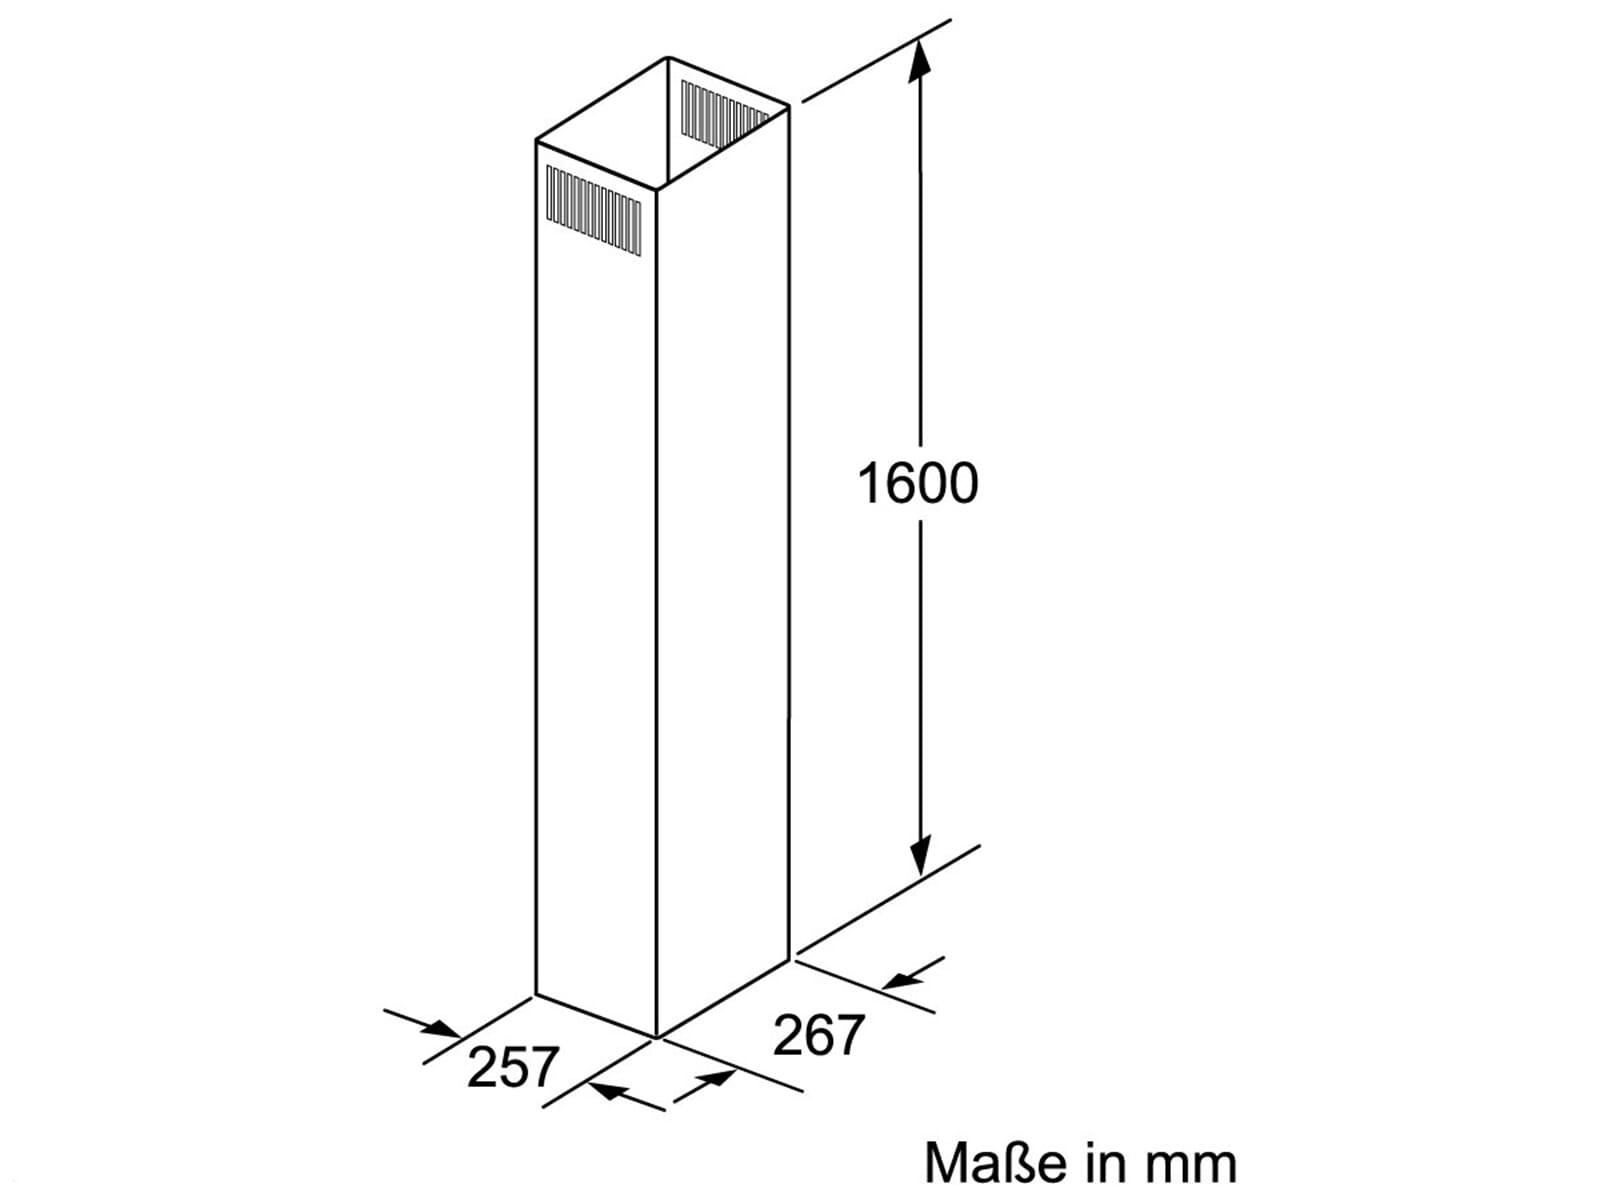 Siemens LZ12375 Kaminverlängerung 1600 mm